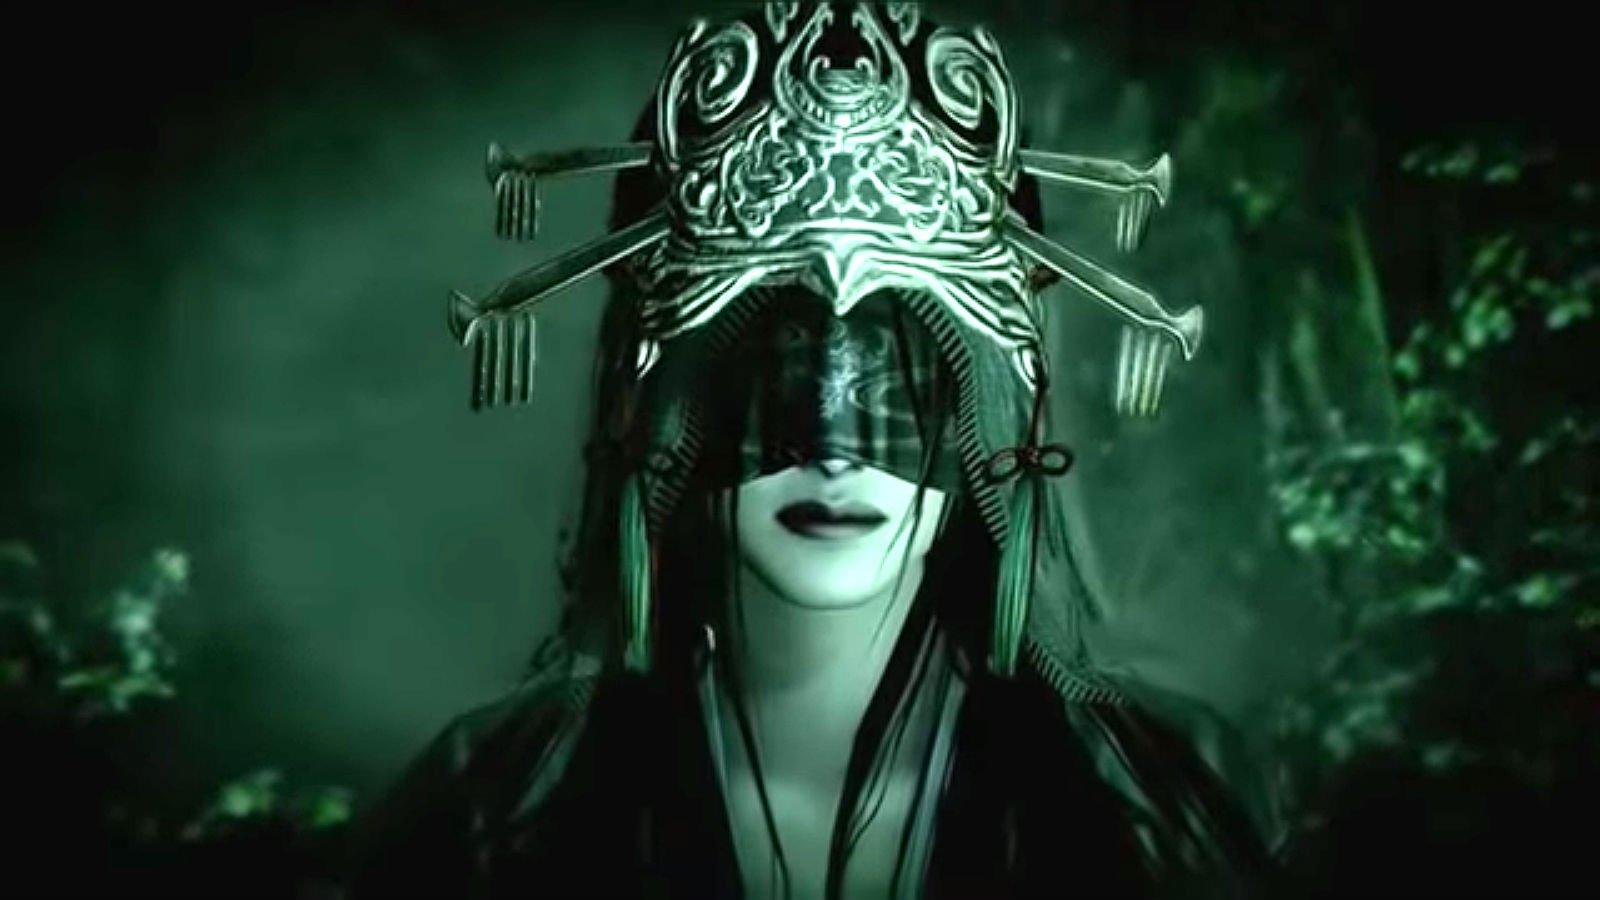 ... fantasy gothic japanese wallpaper | 1600x900 | 623930 | WallpaperUP